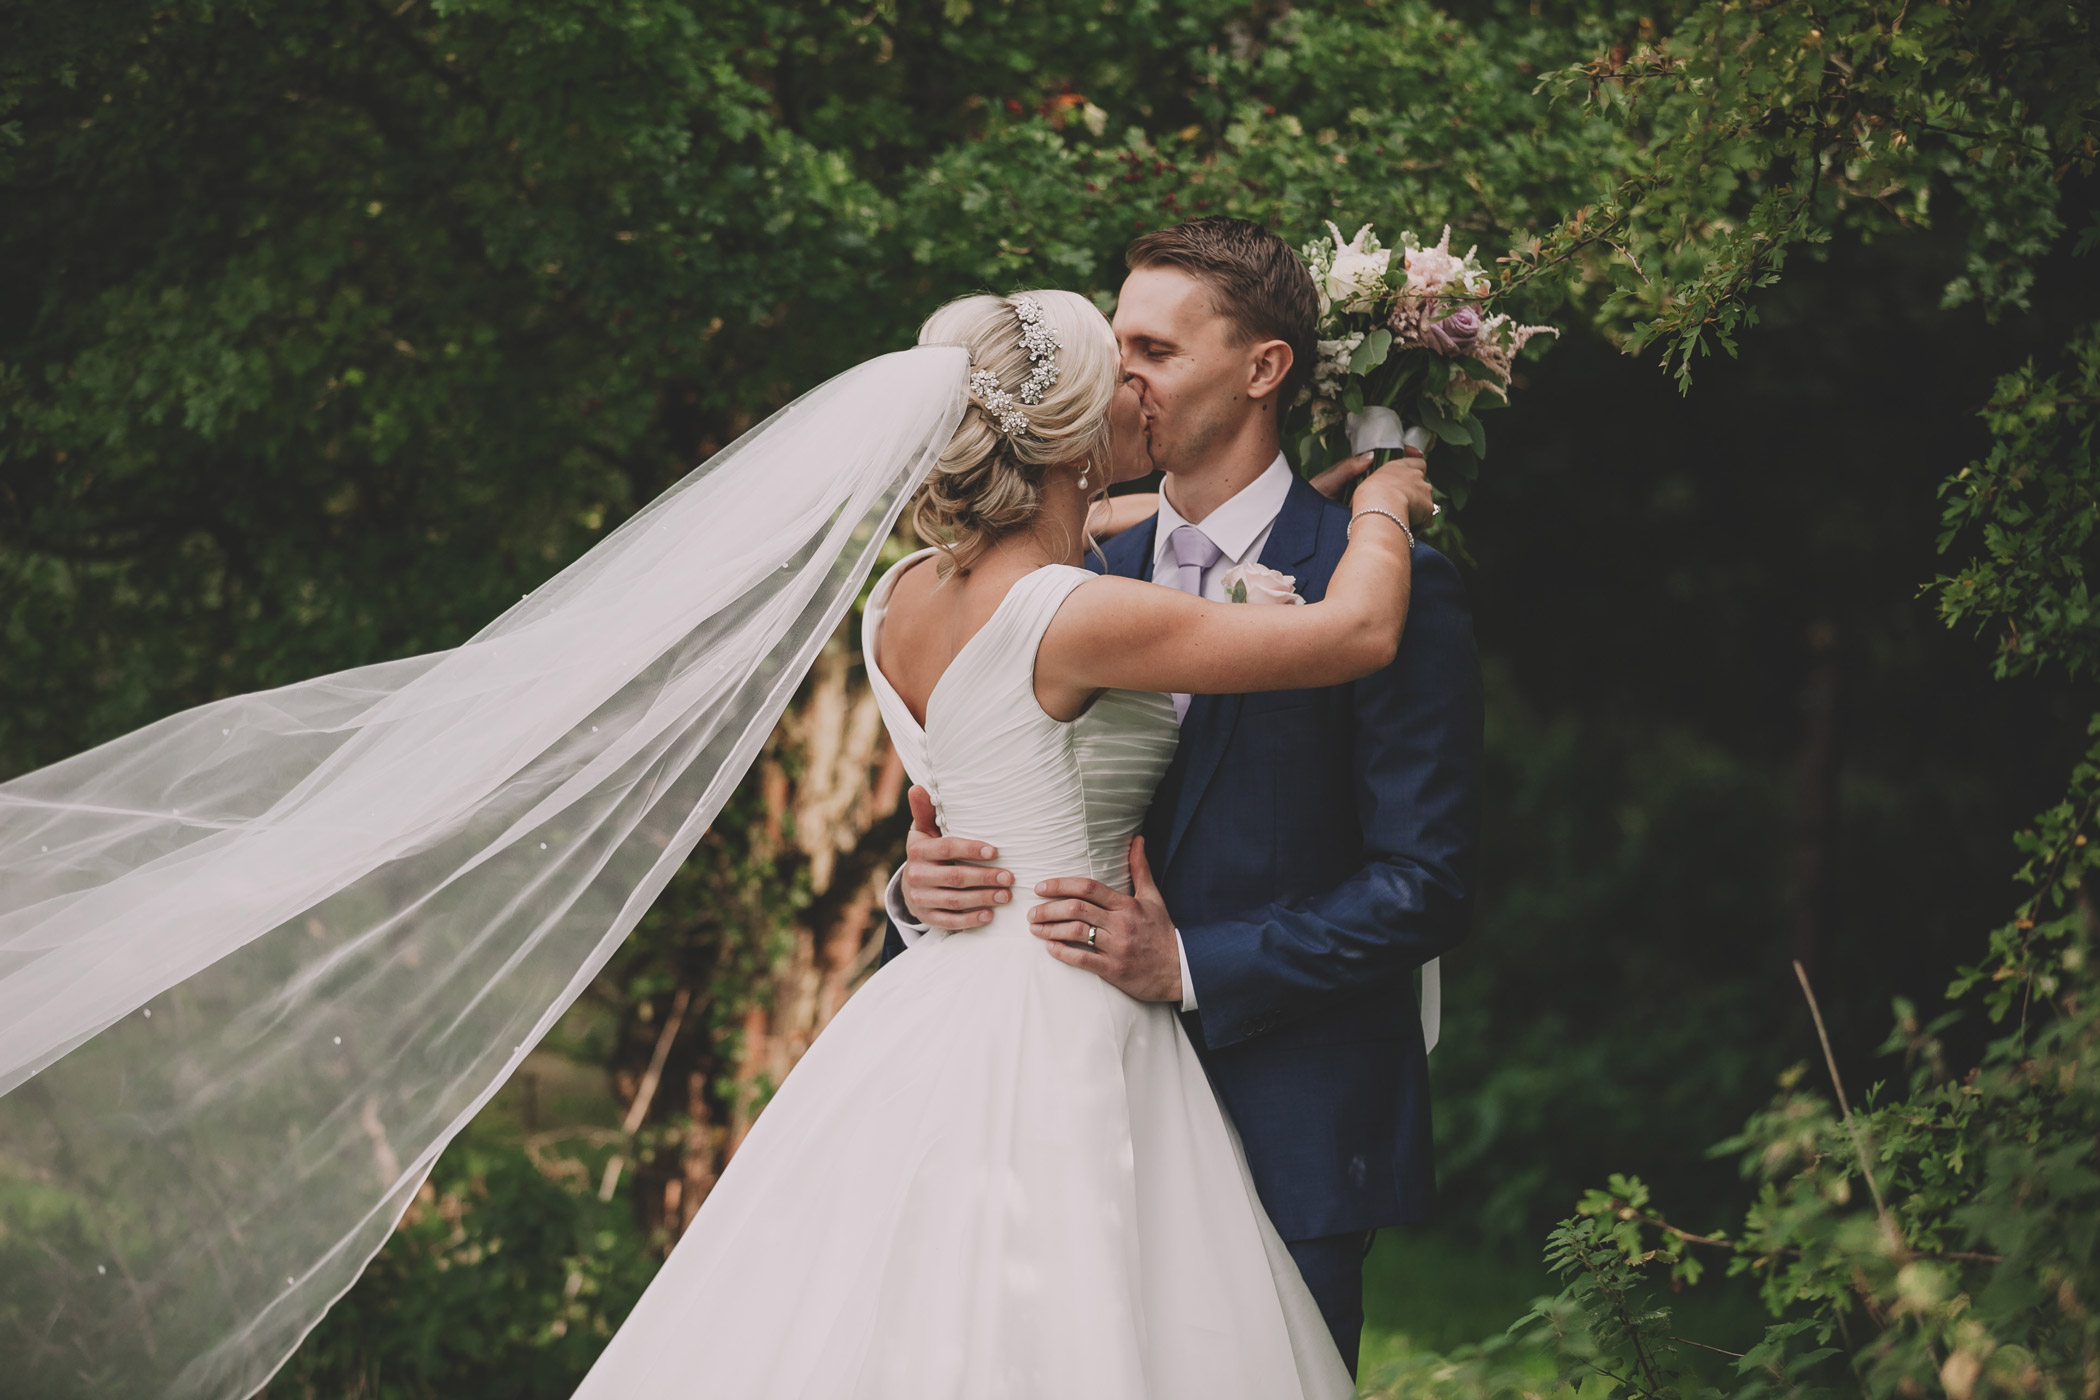 ruth-allen-wedding-photography-photographer-17